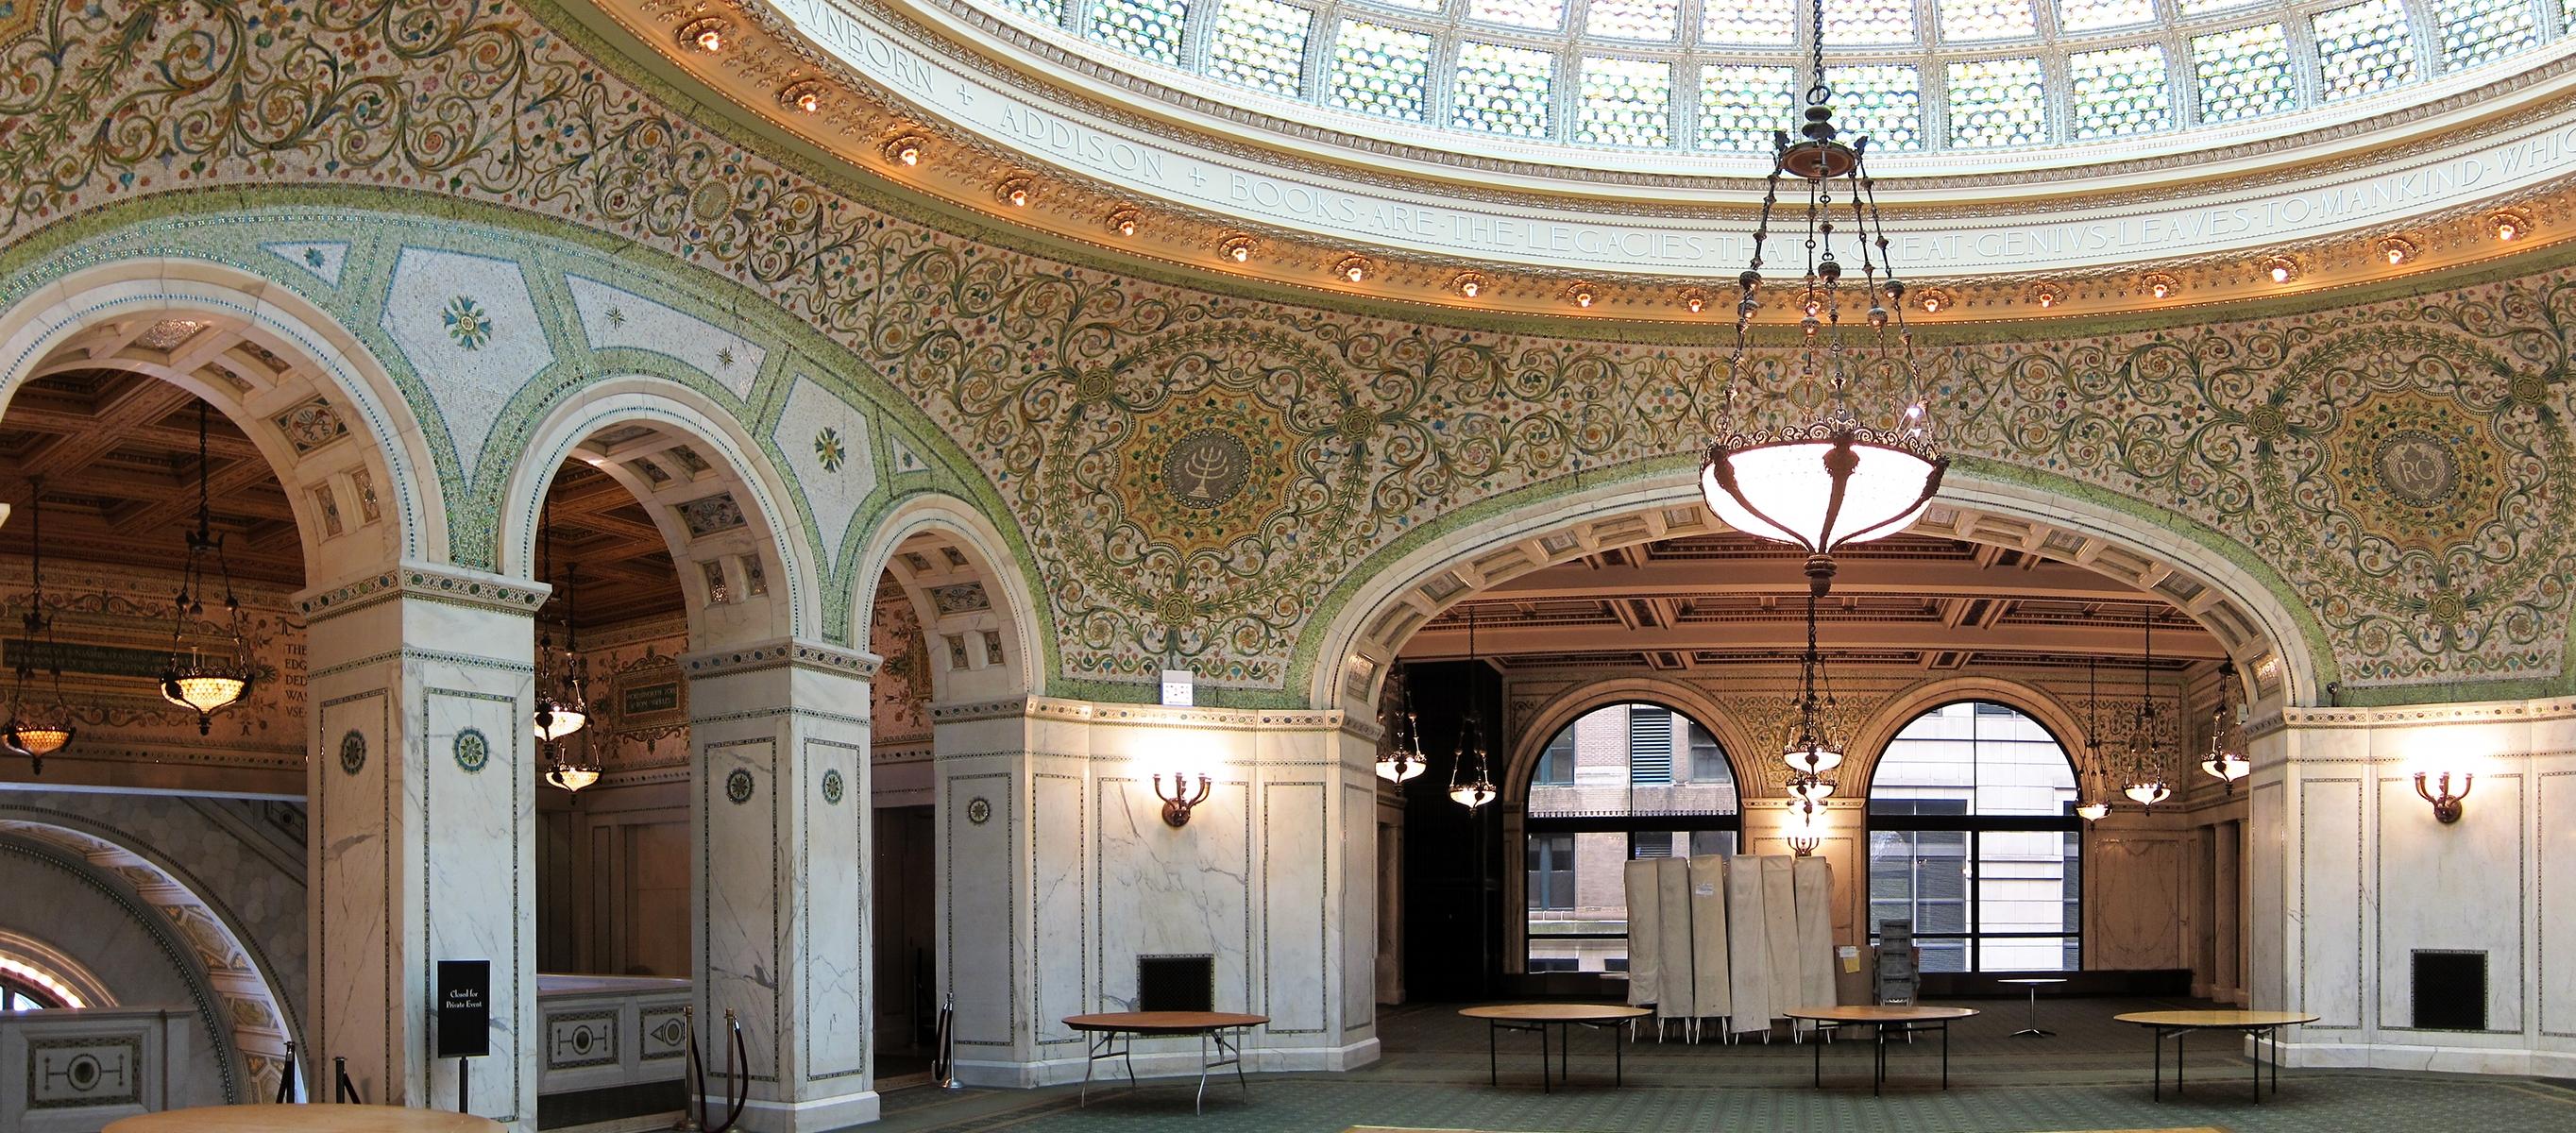 Chicago cultural center.jpg